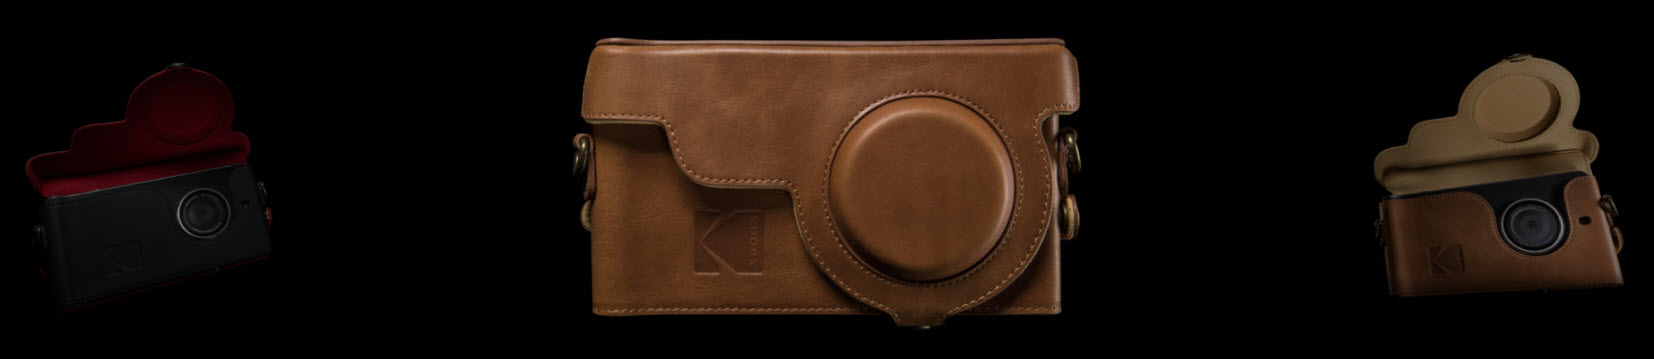 Kodak Ektra smartphone camera case